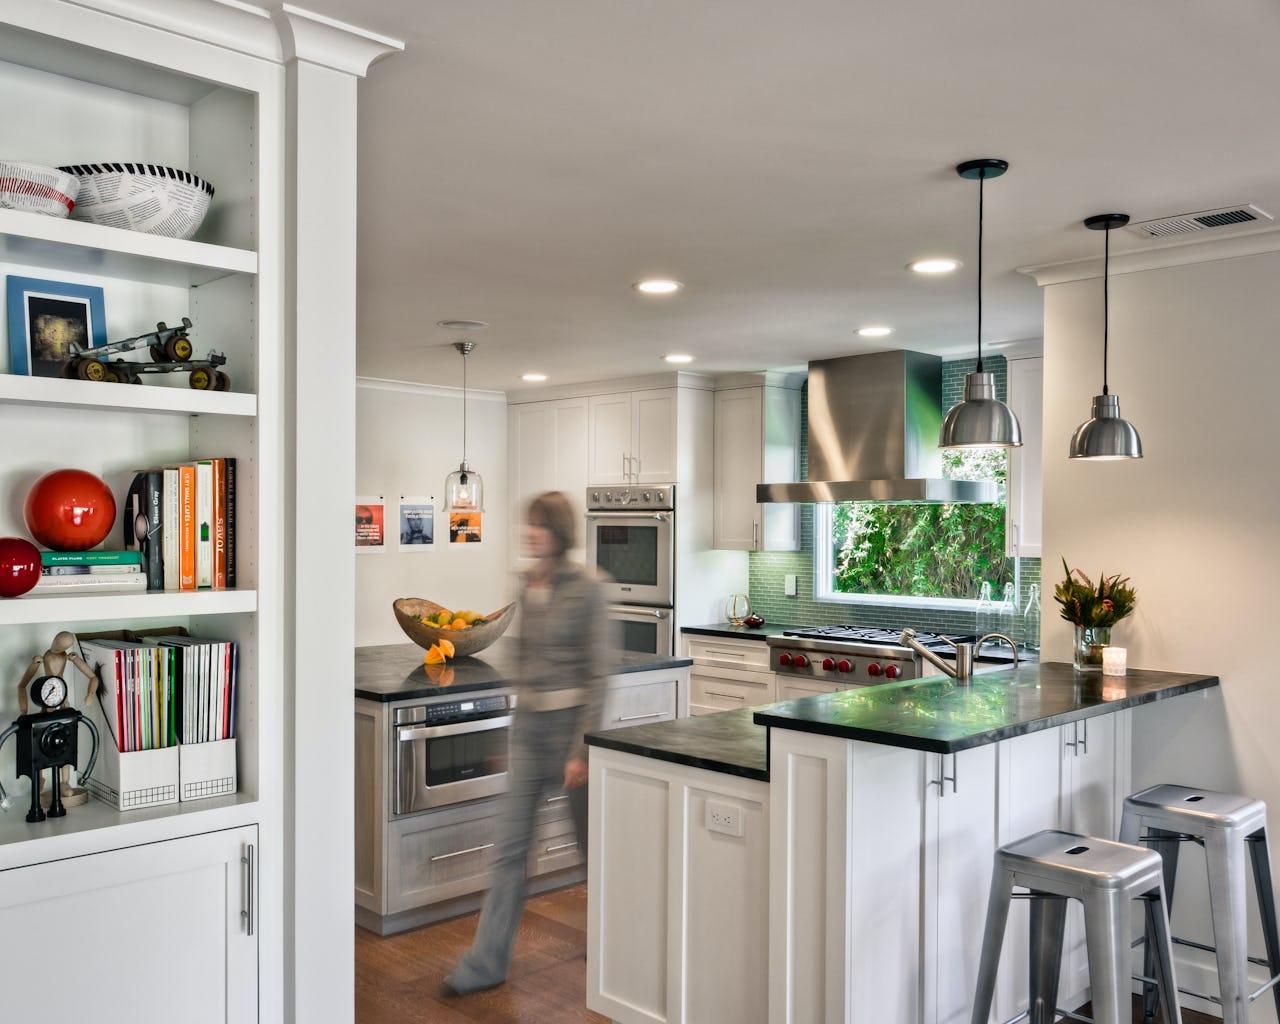 Studio karliova south court remodel interior design kitchen 3